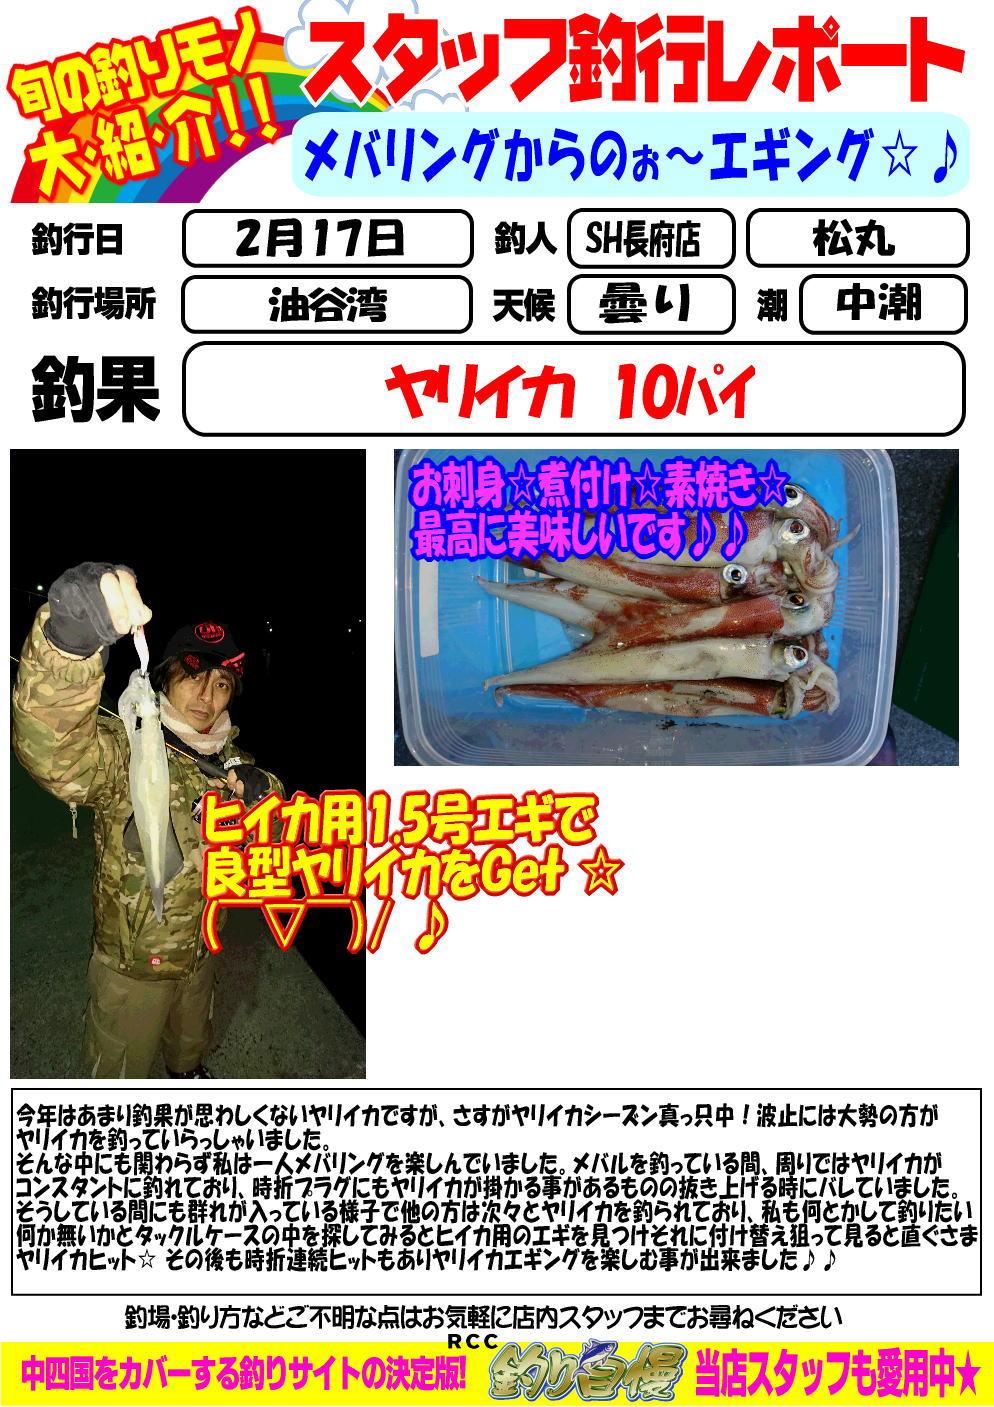 http://www.e-angle.co.jp/shop/blog/blog-choufu-20170217matumaru.jpg